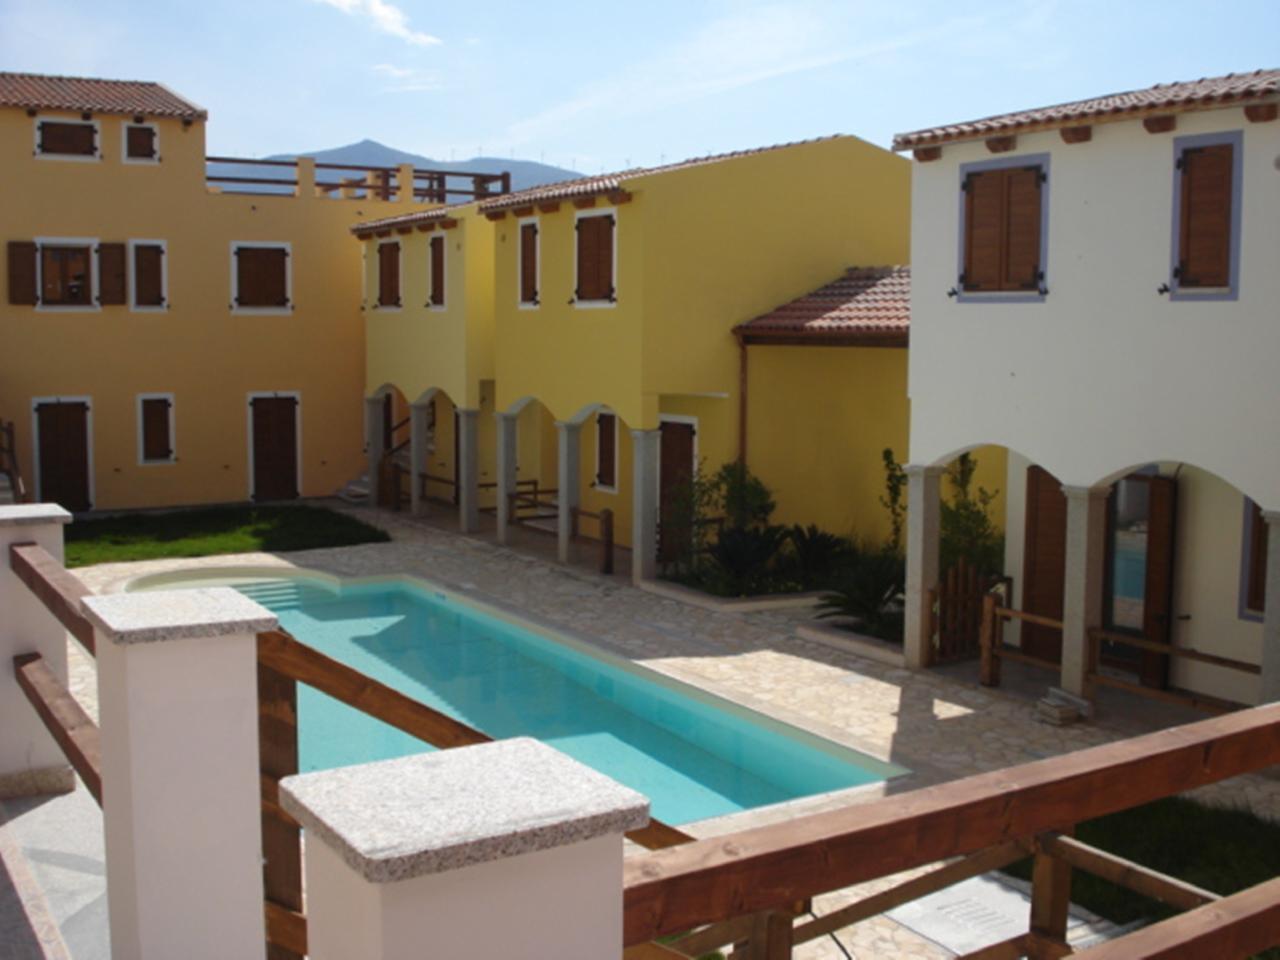 Ferienwohnung Residence Li Duni con piscina (2626686), Viddalba, Sassari, Sardinien, Italien, Bild 2